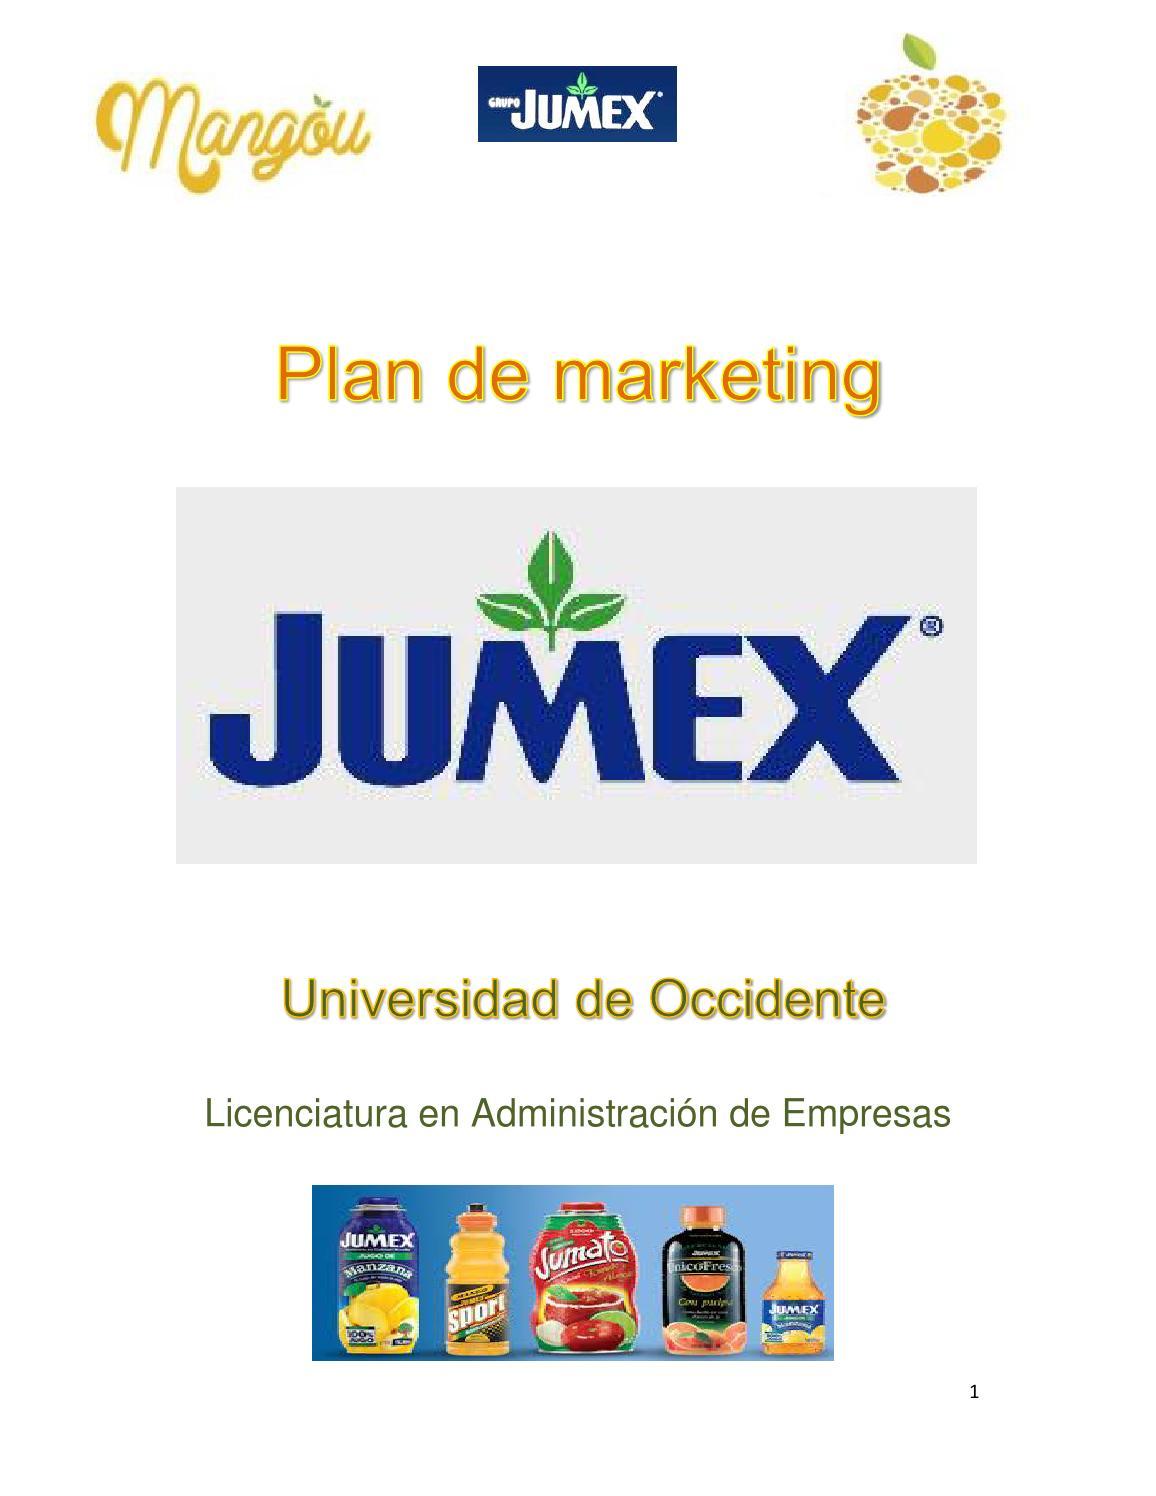 plan de marketing mangou para jumex by FRANKLINOMAR - issuu